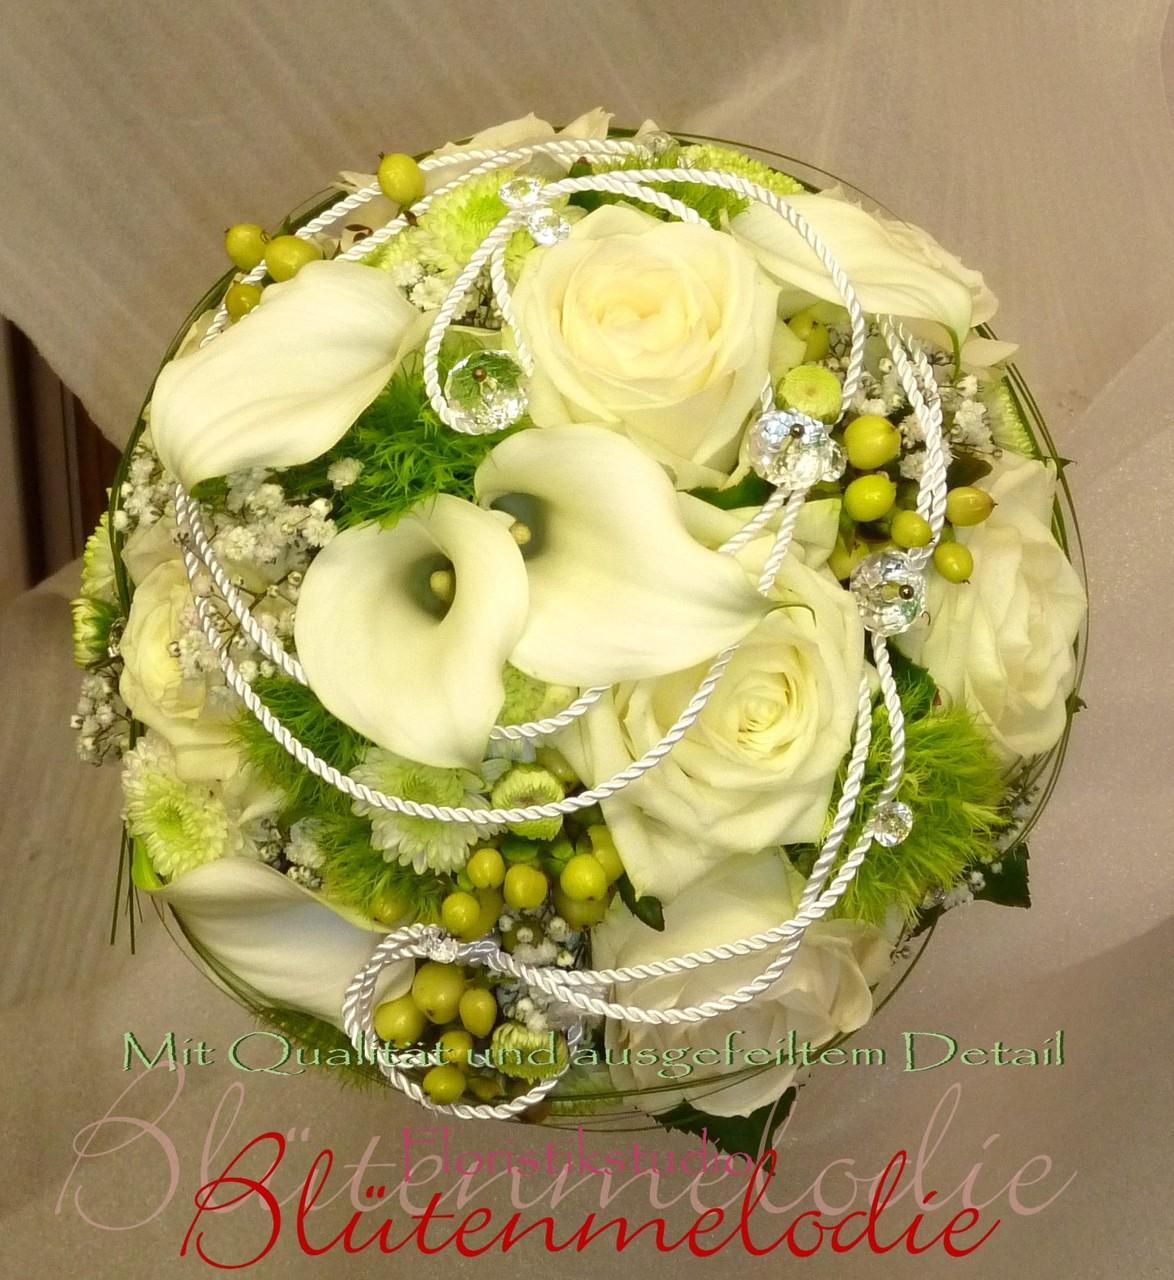 blumen floraler schmuck zu jedem anlass bl tenmelodie floristikstudio fr se. Black Bedroom Furniture Sets. Home Design Ideas